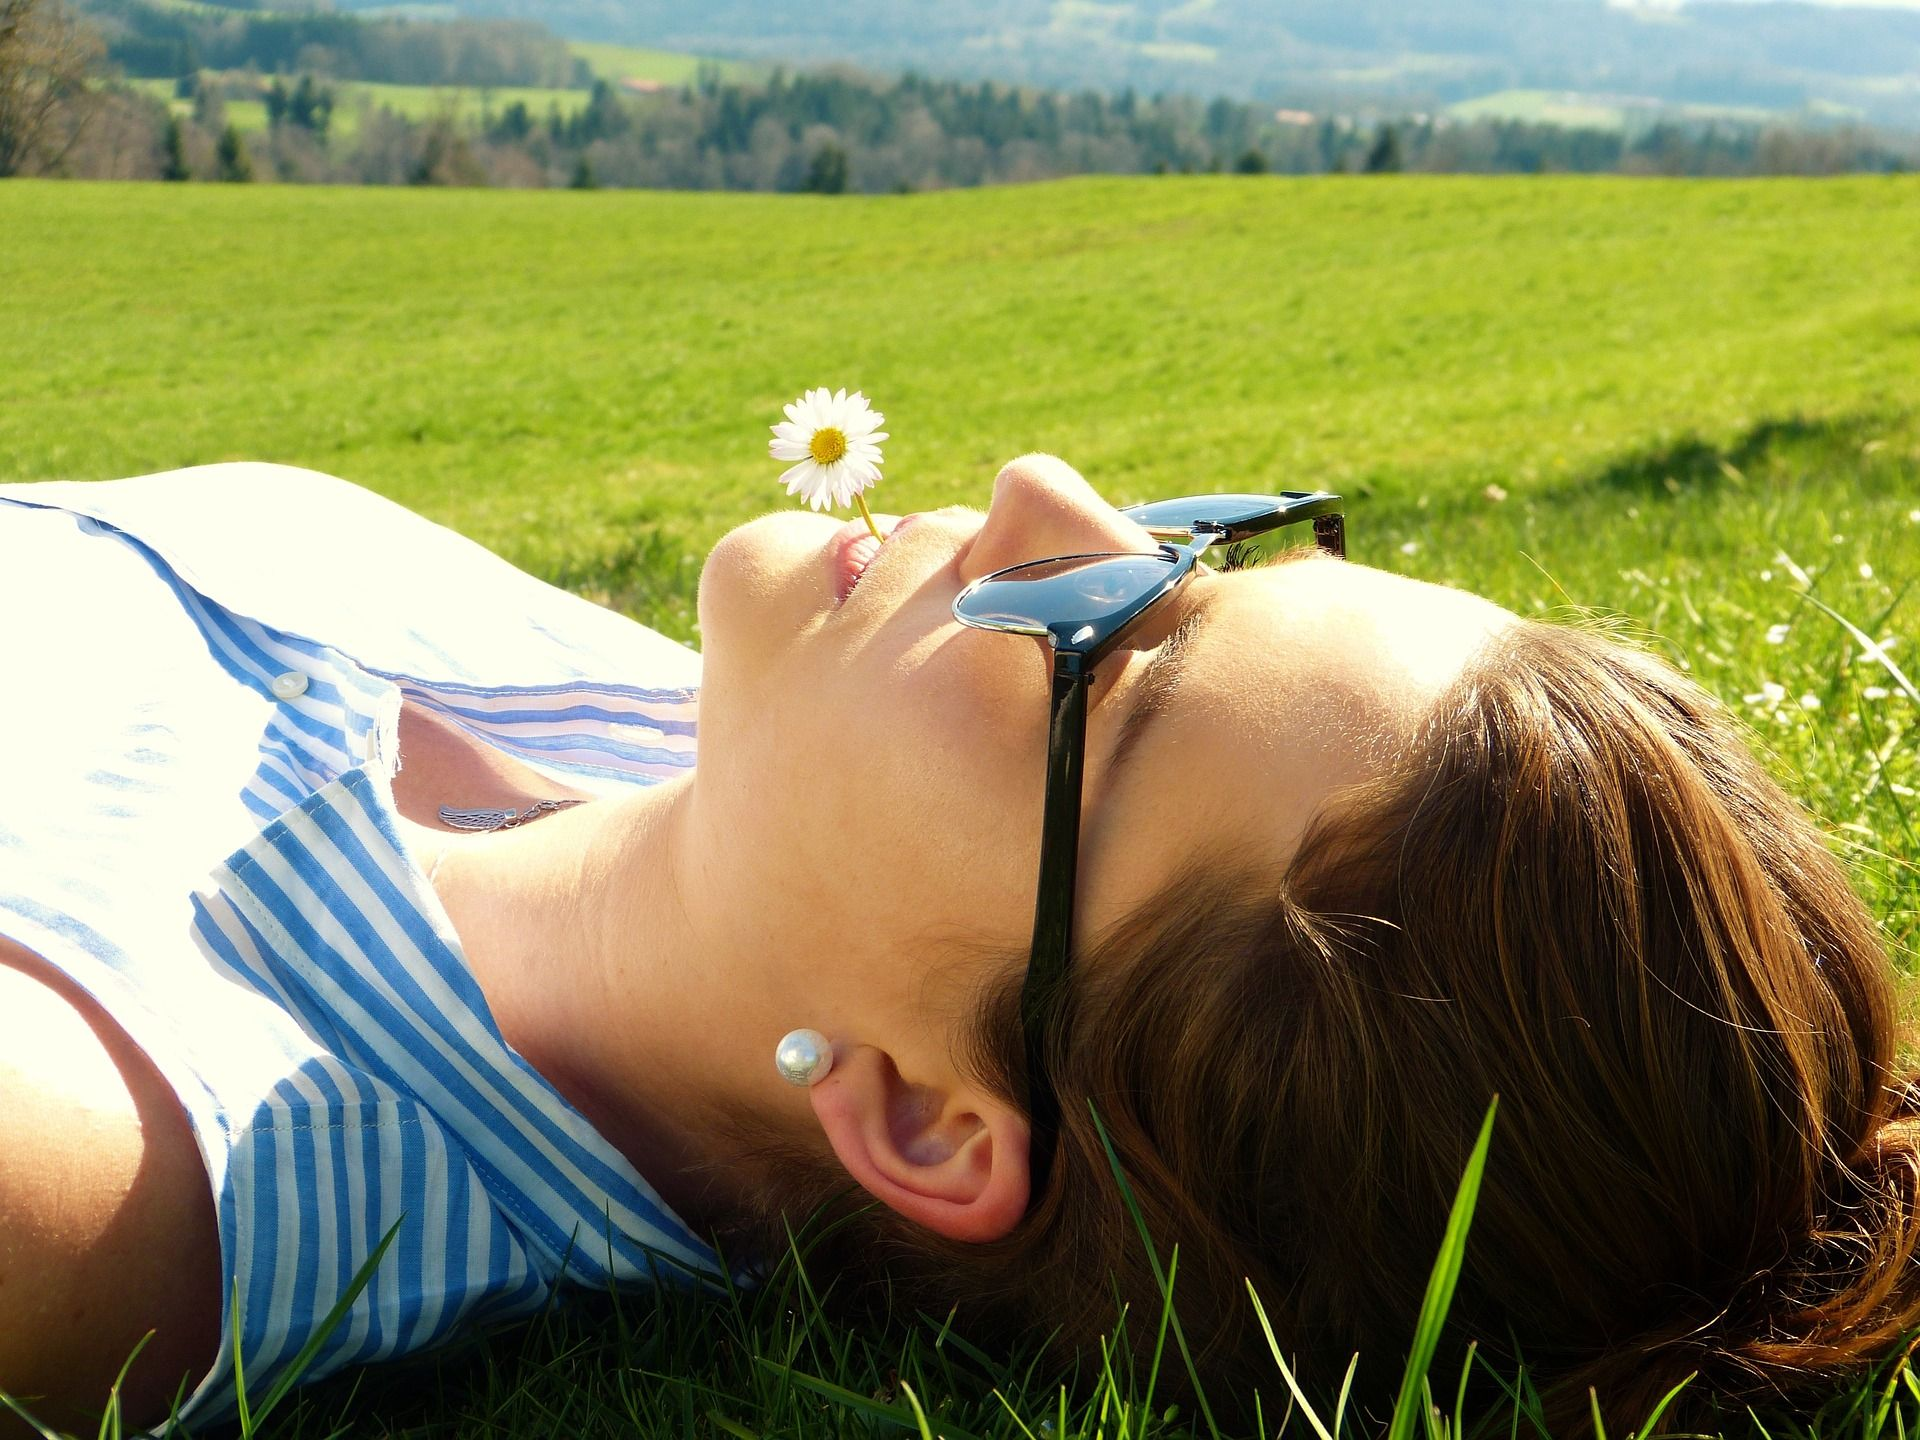 Woman lying the grass